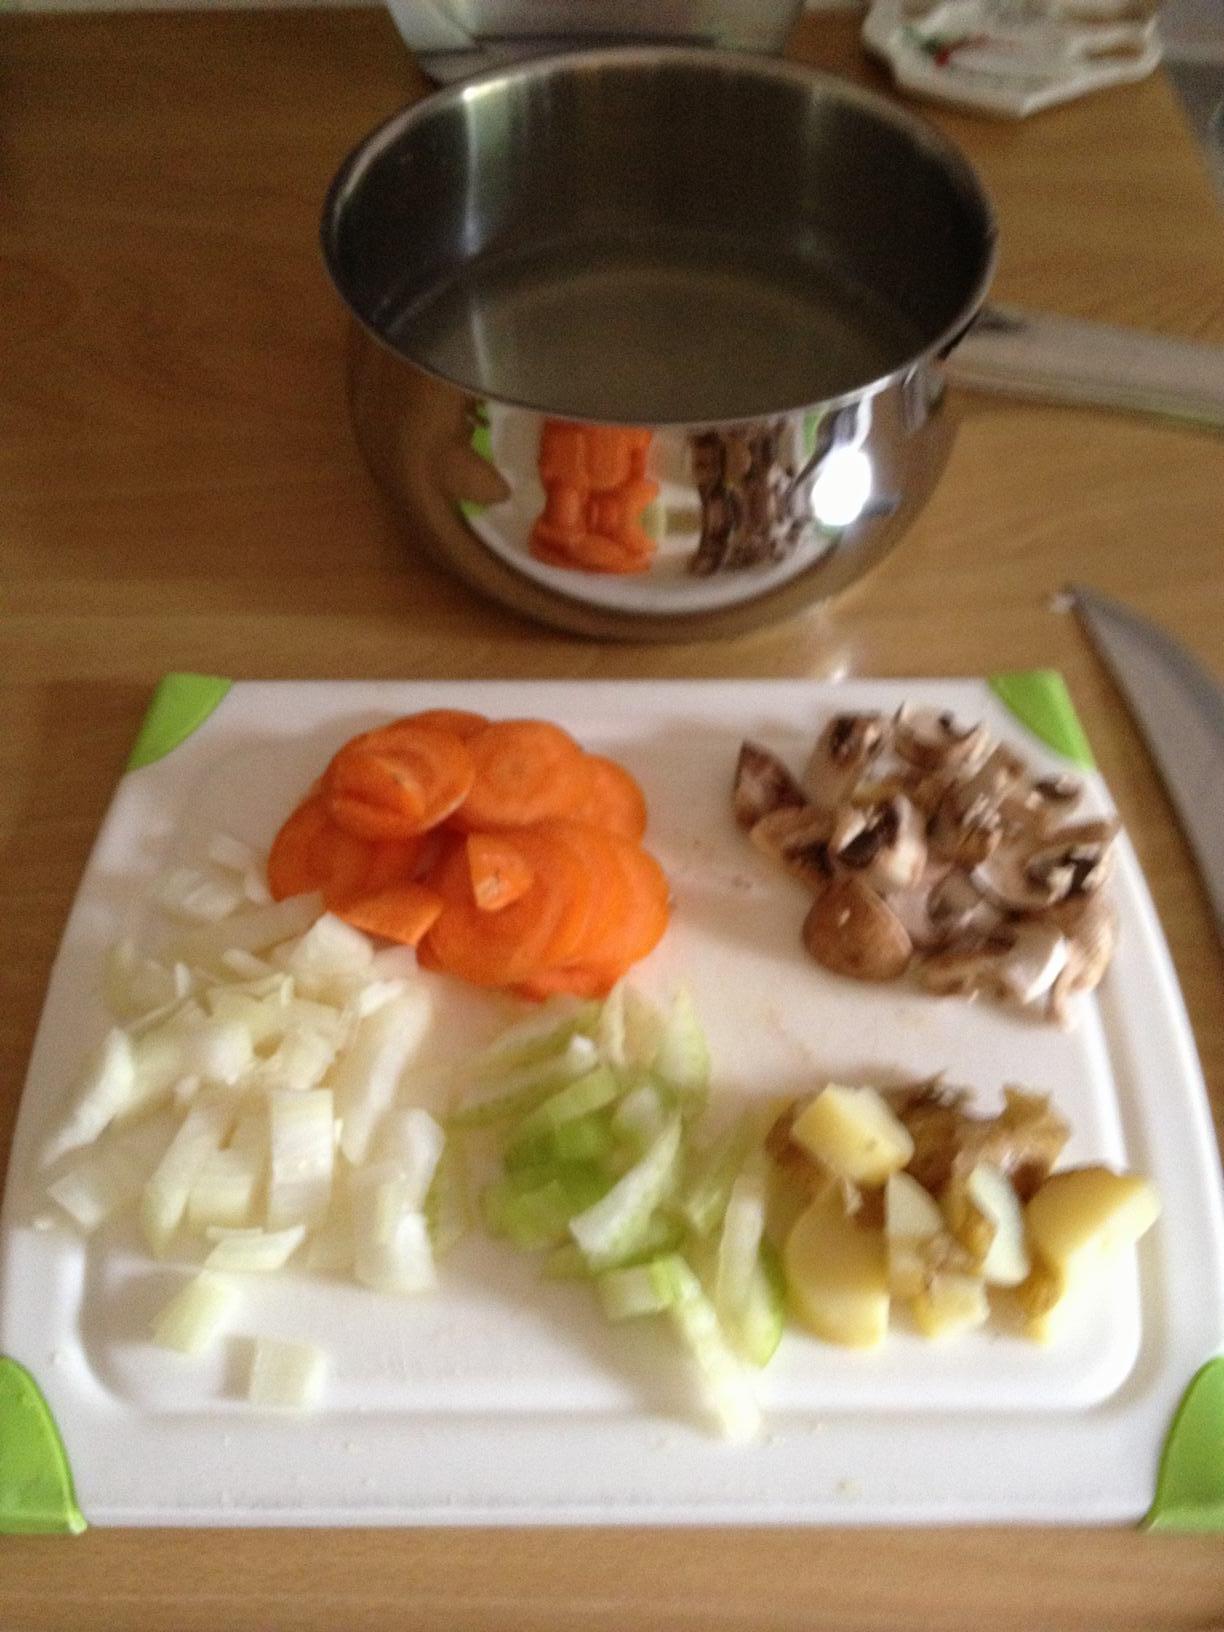 Day 4: Dinner Preparation